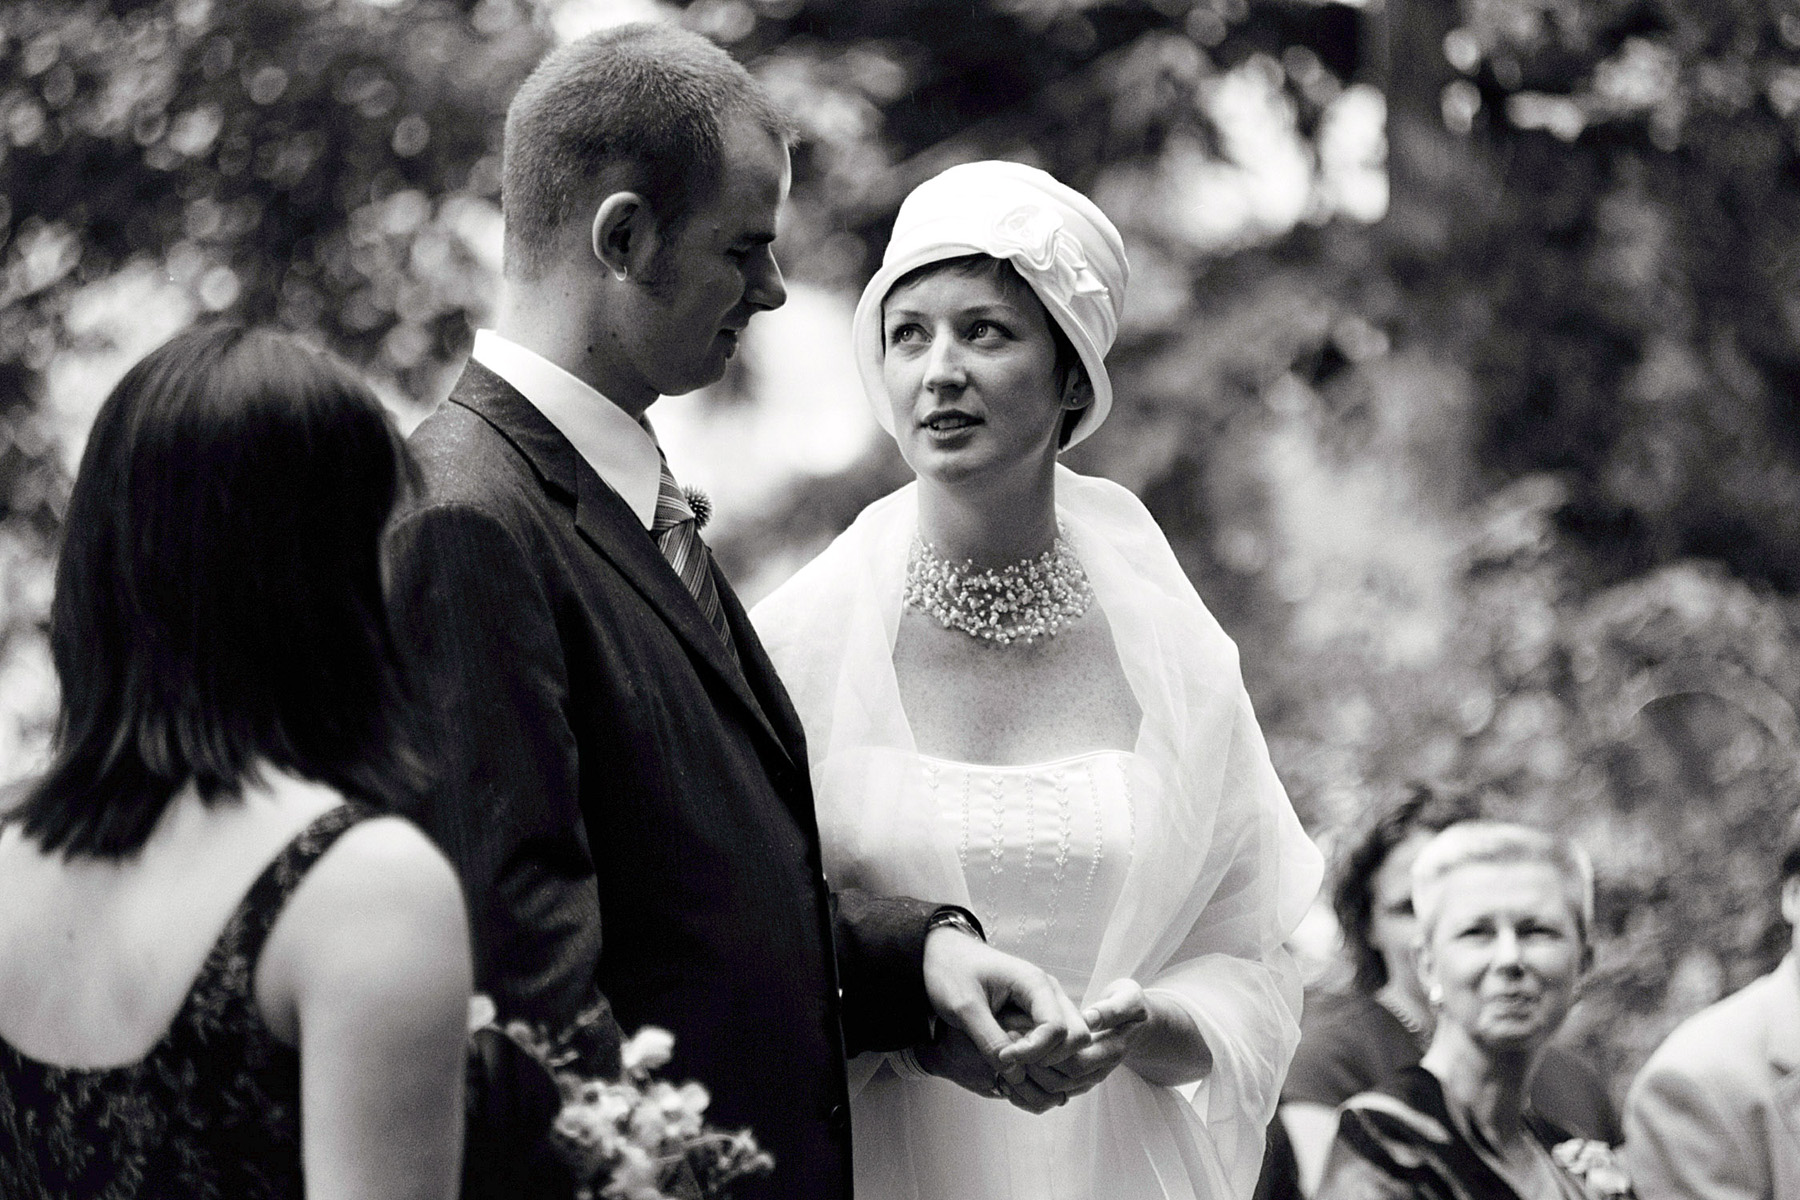 portland wedding ceremony exchange vows